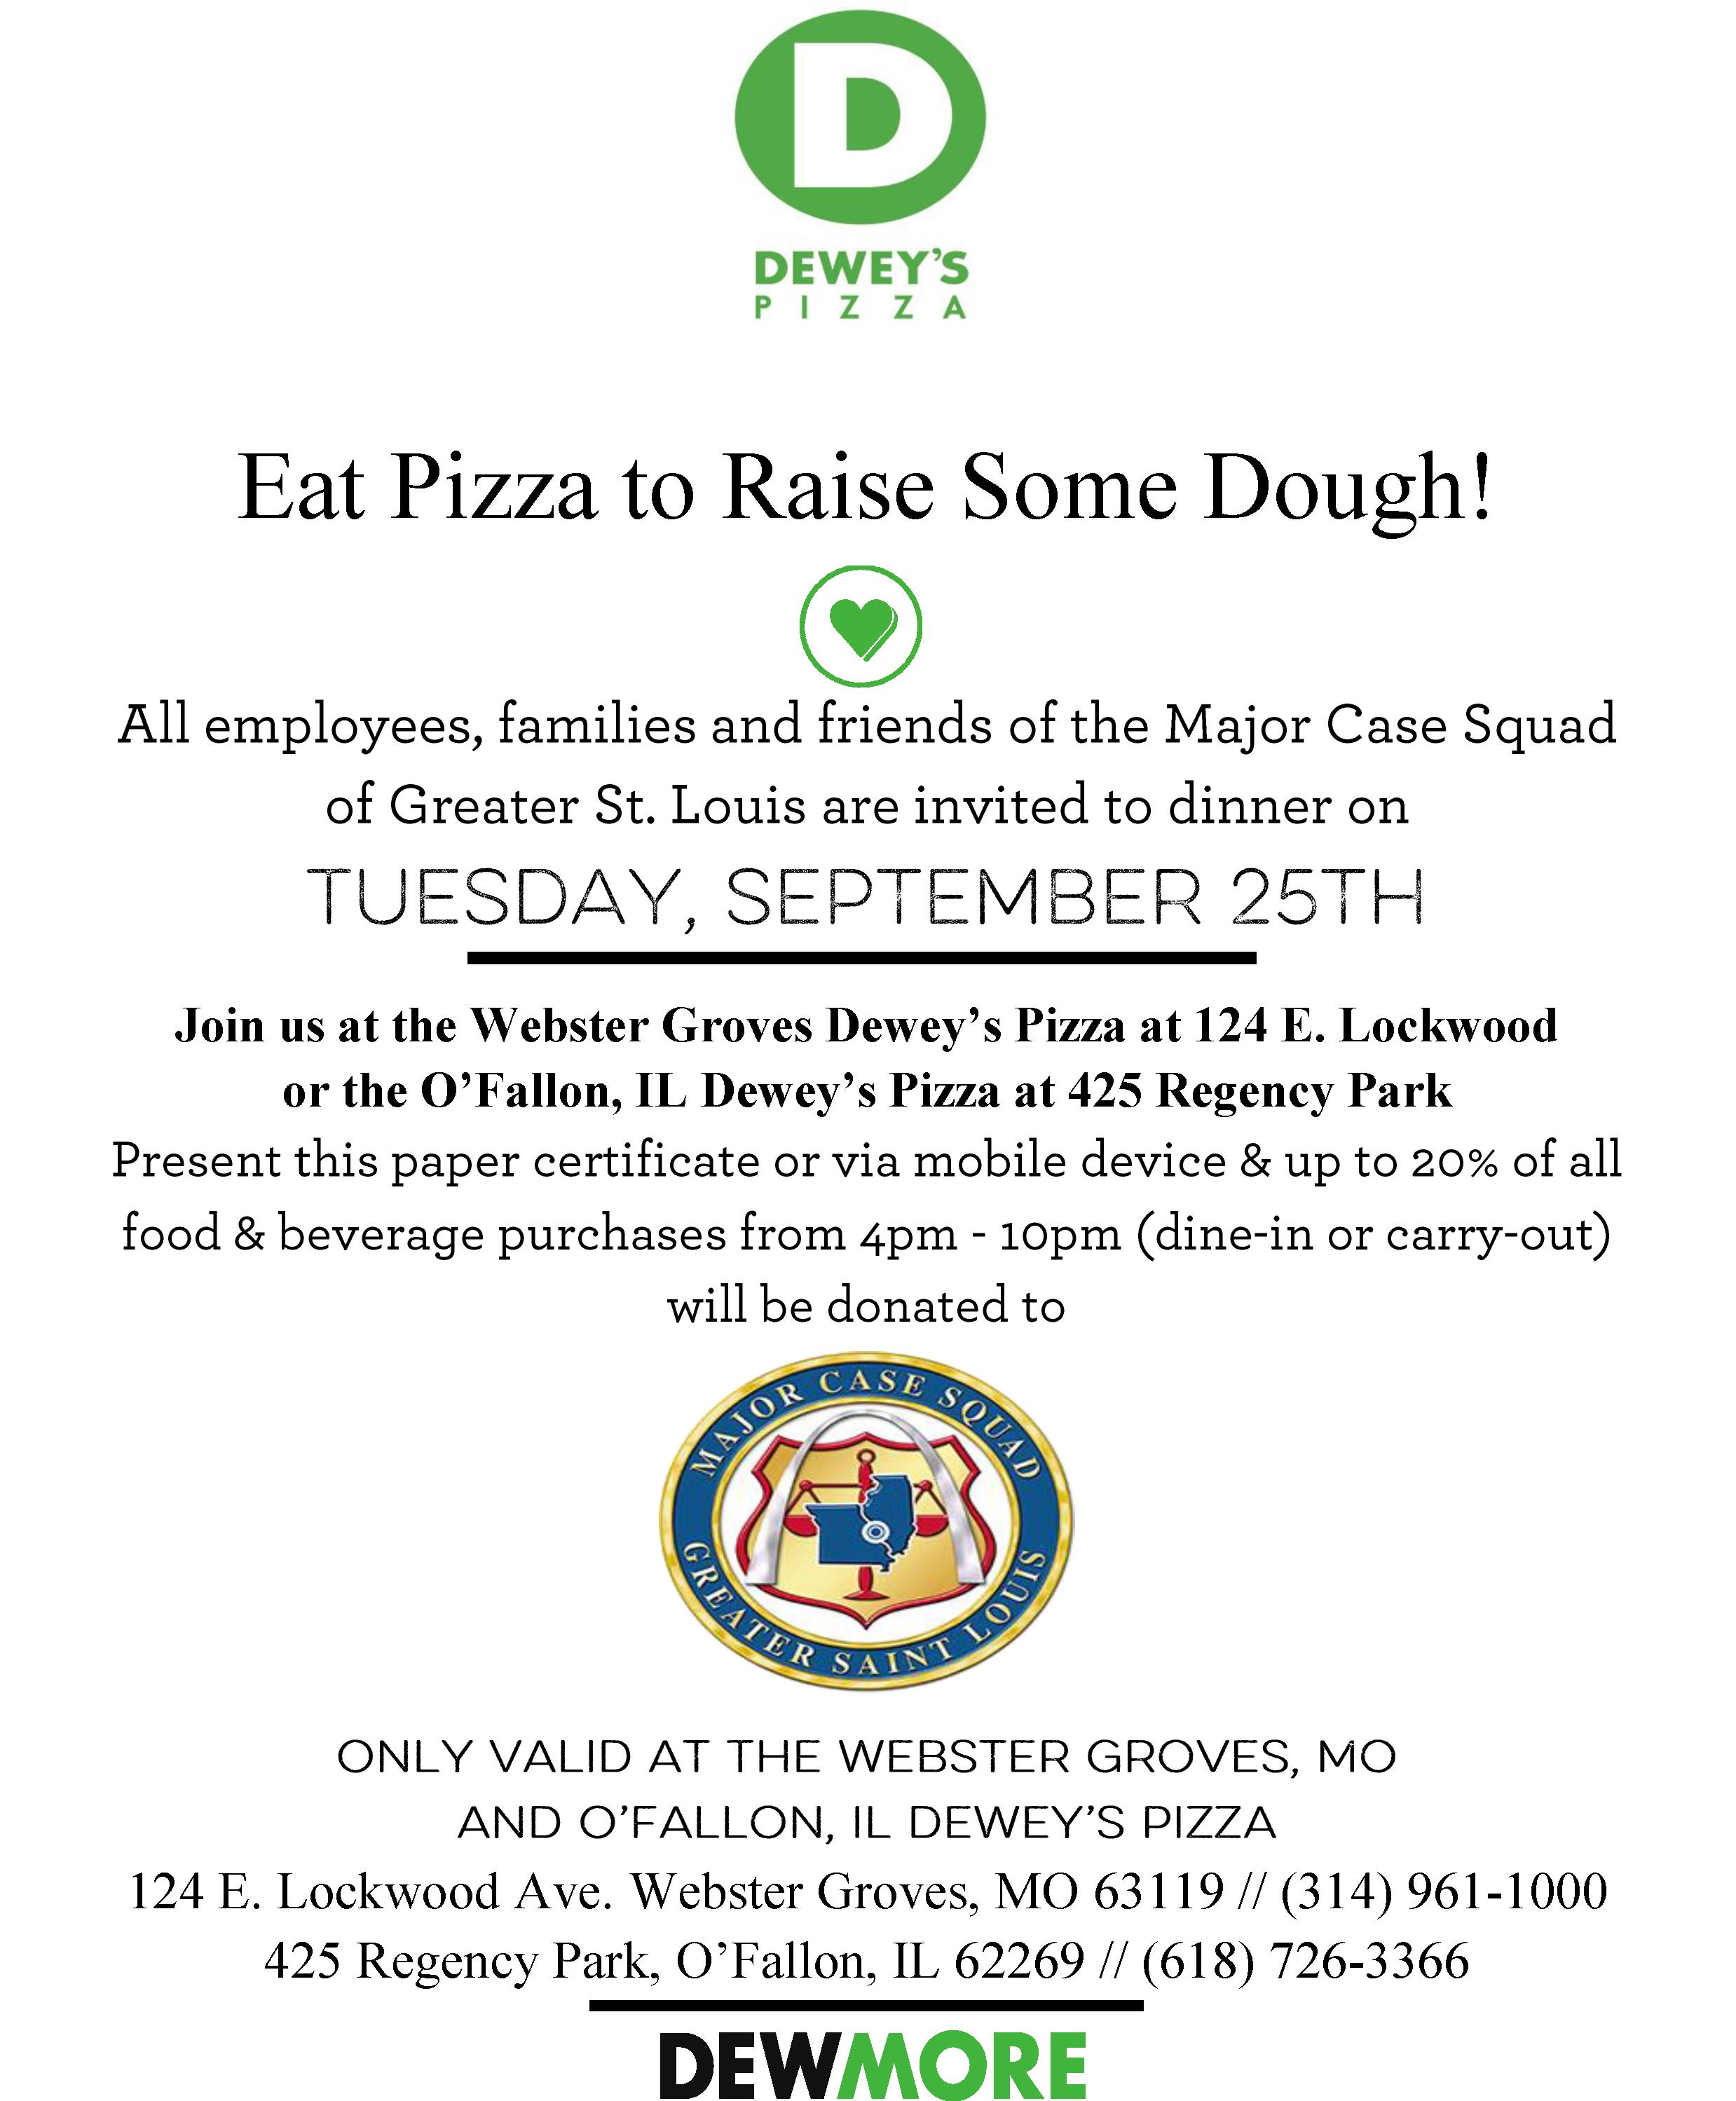 Dewey's Pizza Fundraiser